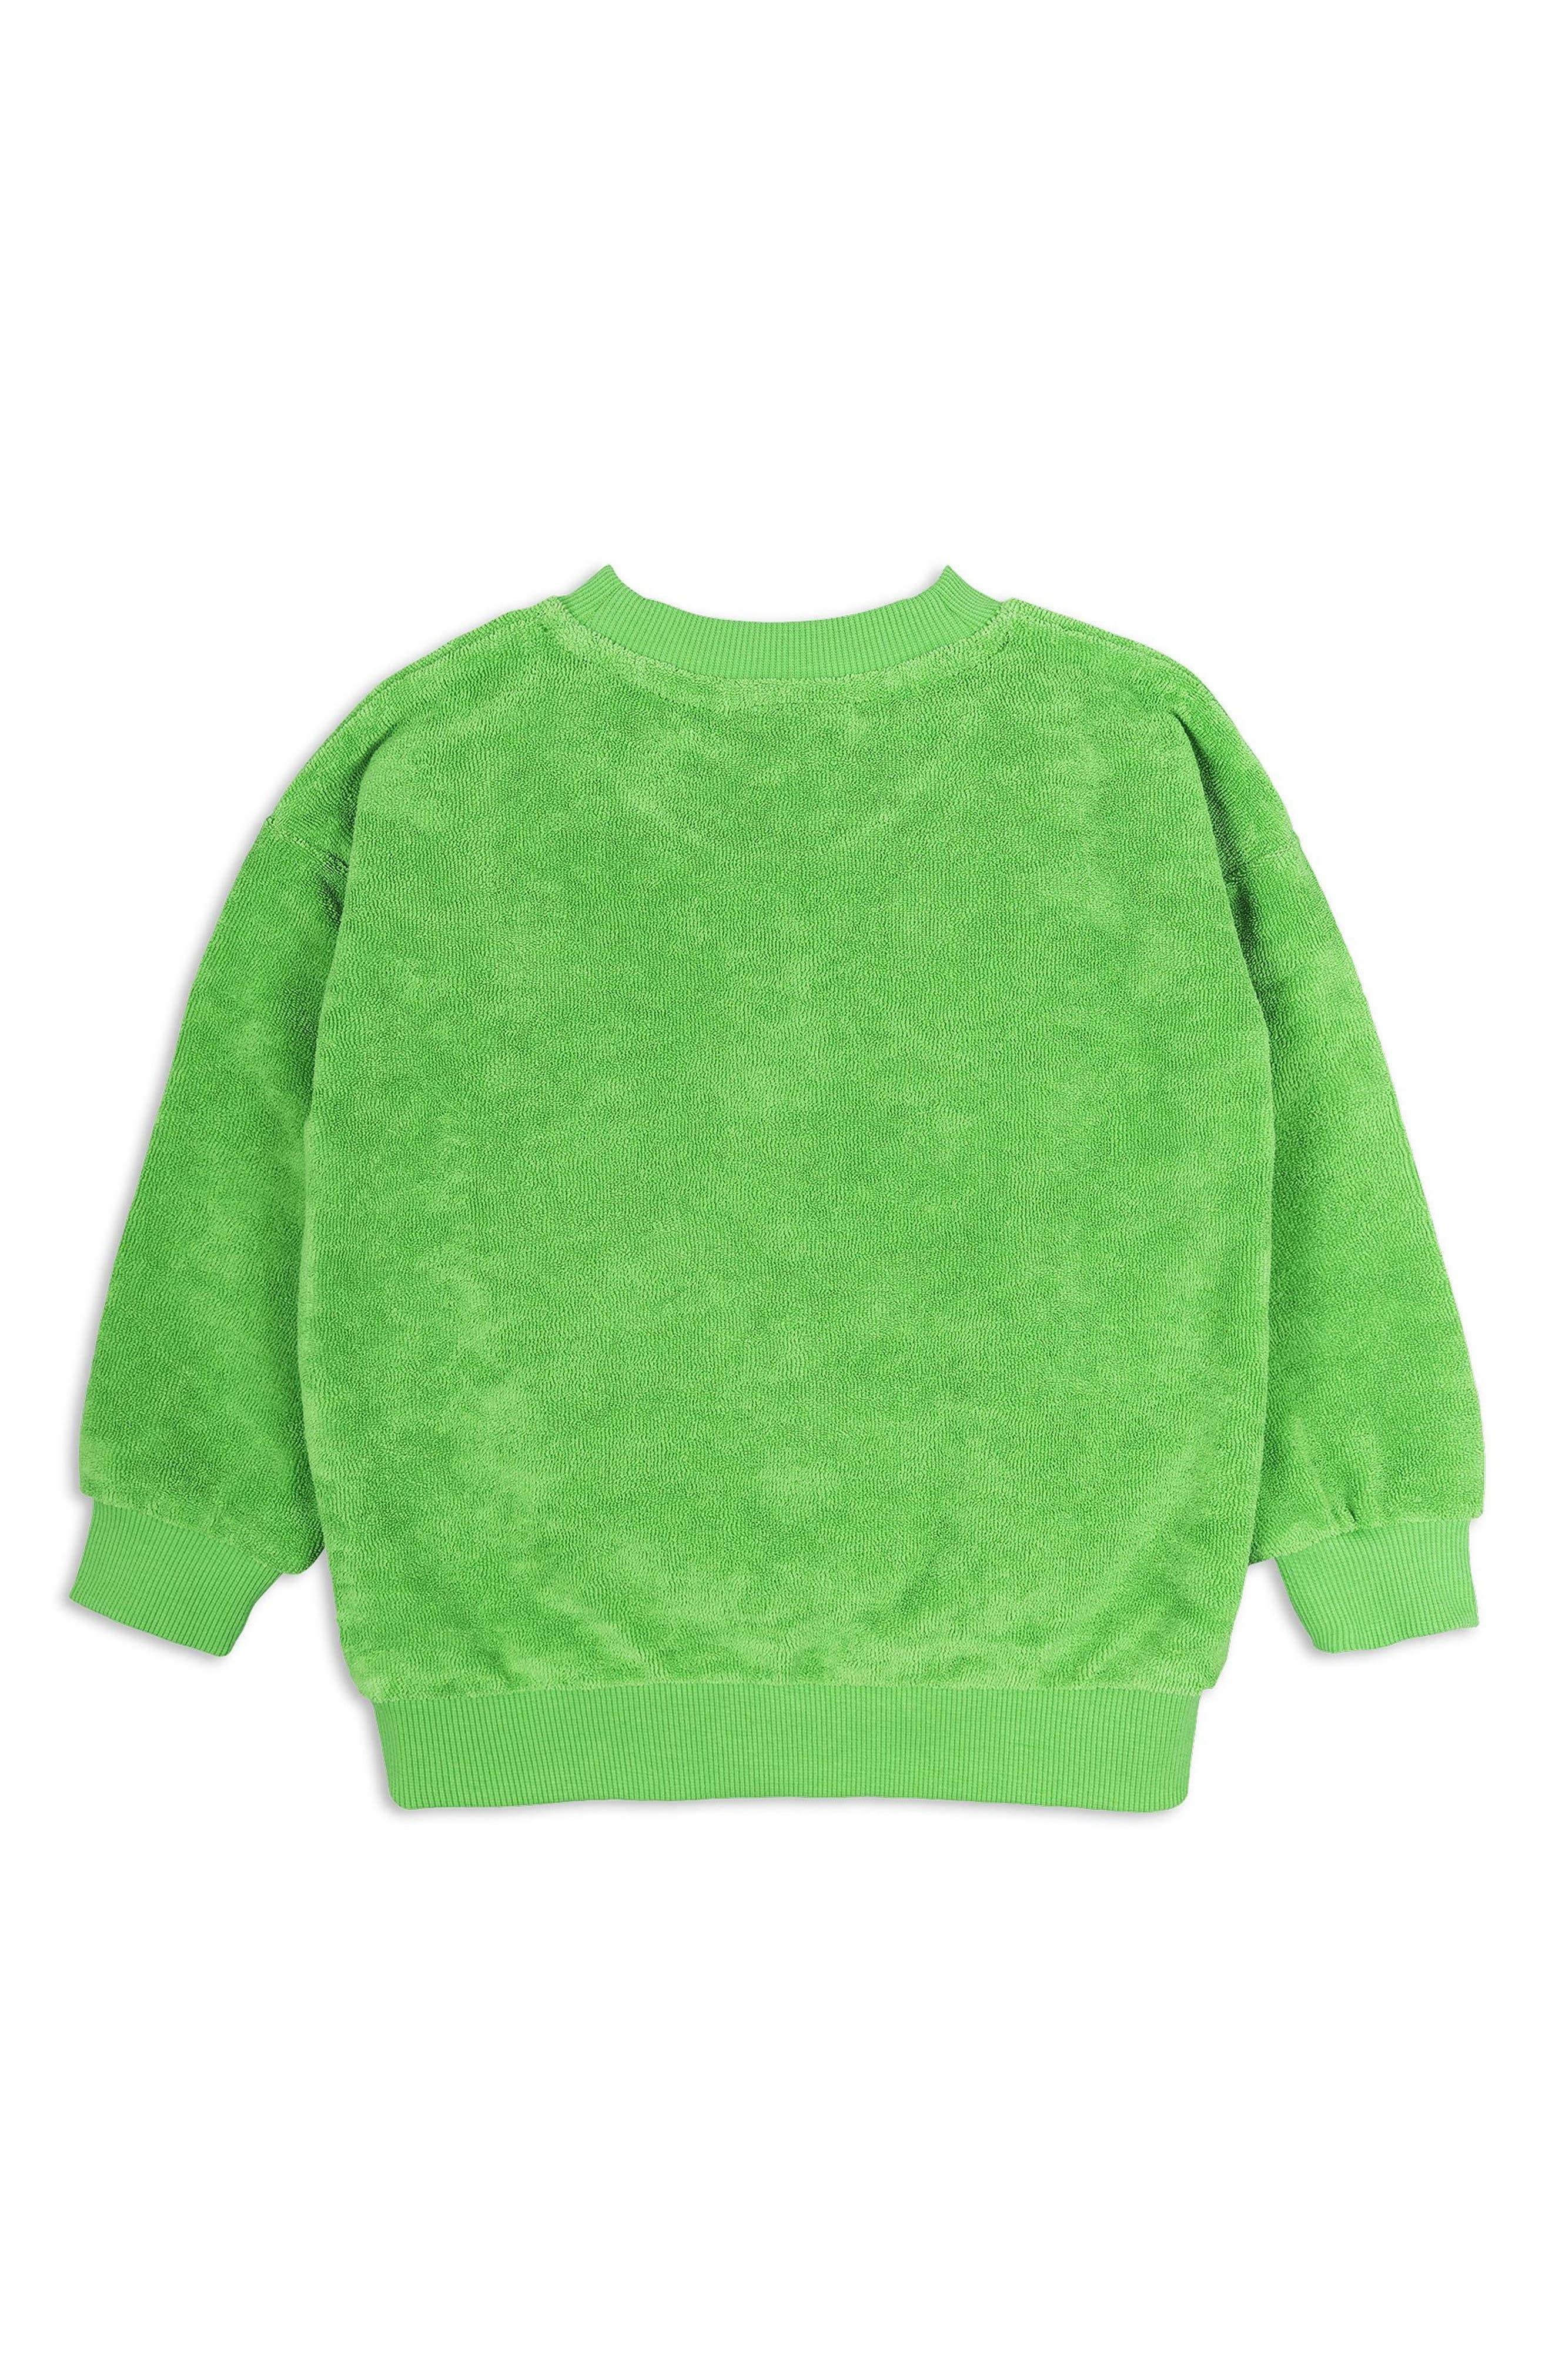 Cucumber Terry Sweatshirt,                             Alternate thumbnail 2, color,                             300